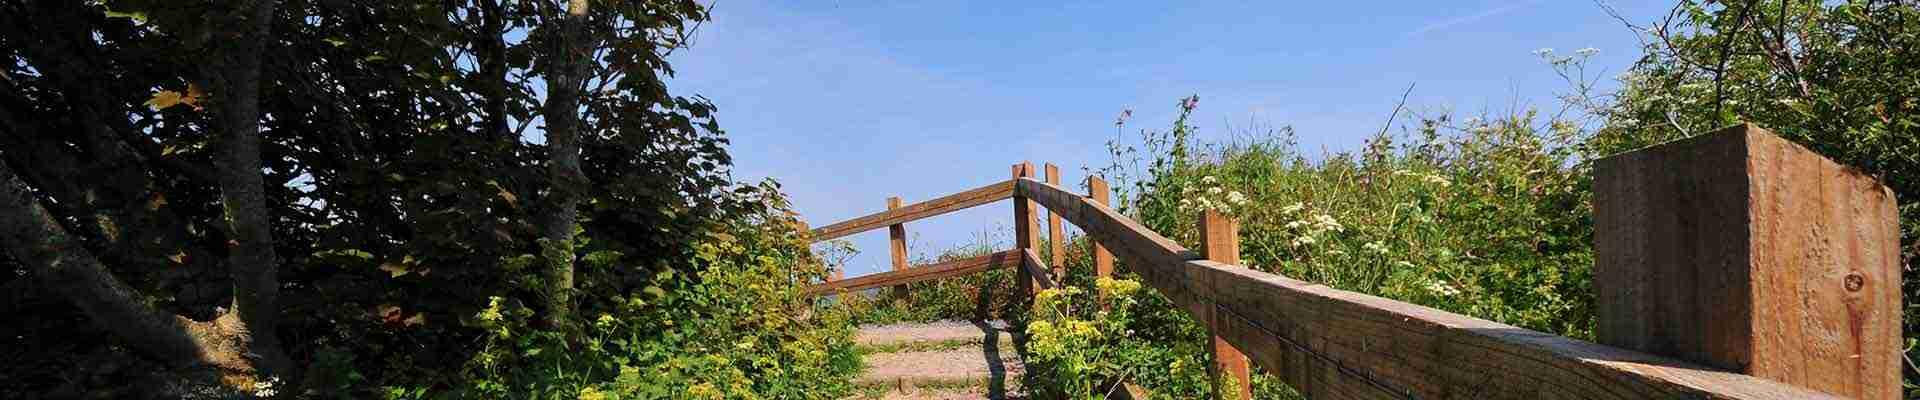 Anglesey Half Marathon (The Island Race)